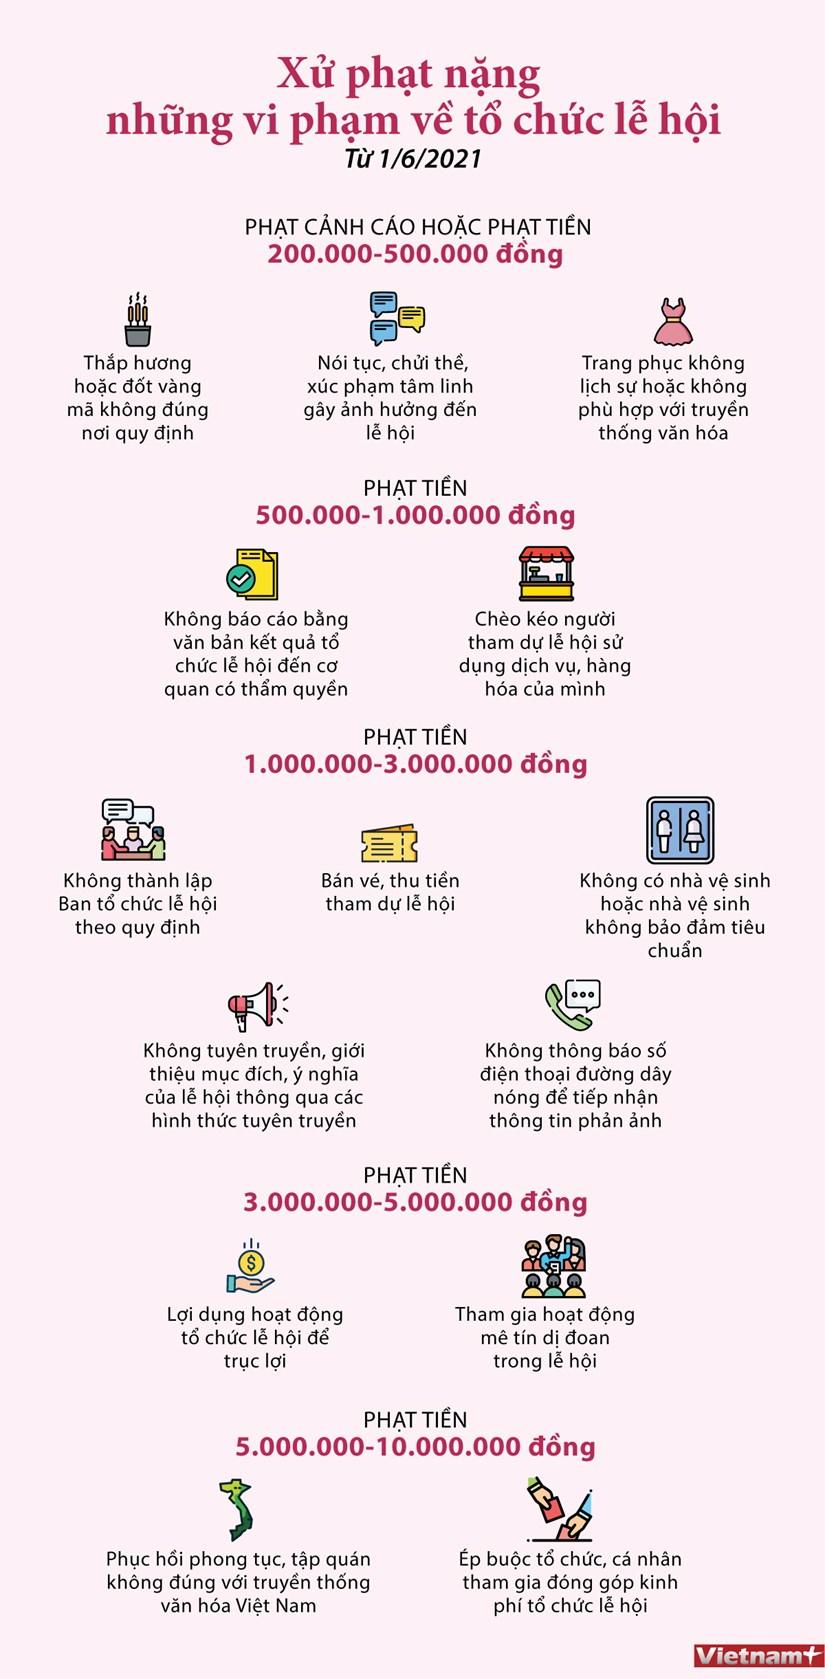 [Infographics] Xu phat nang nhung vi pham ve to chuc le hoi hinh anh 1